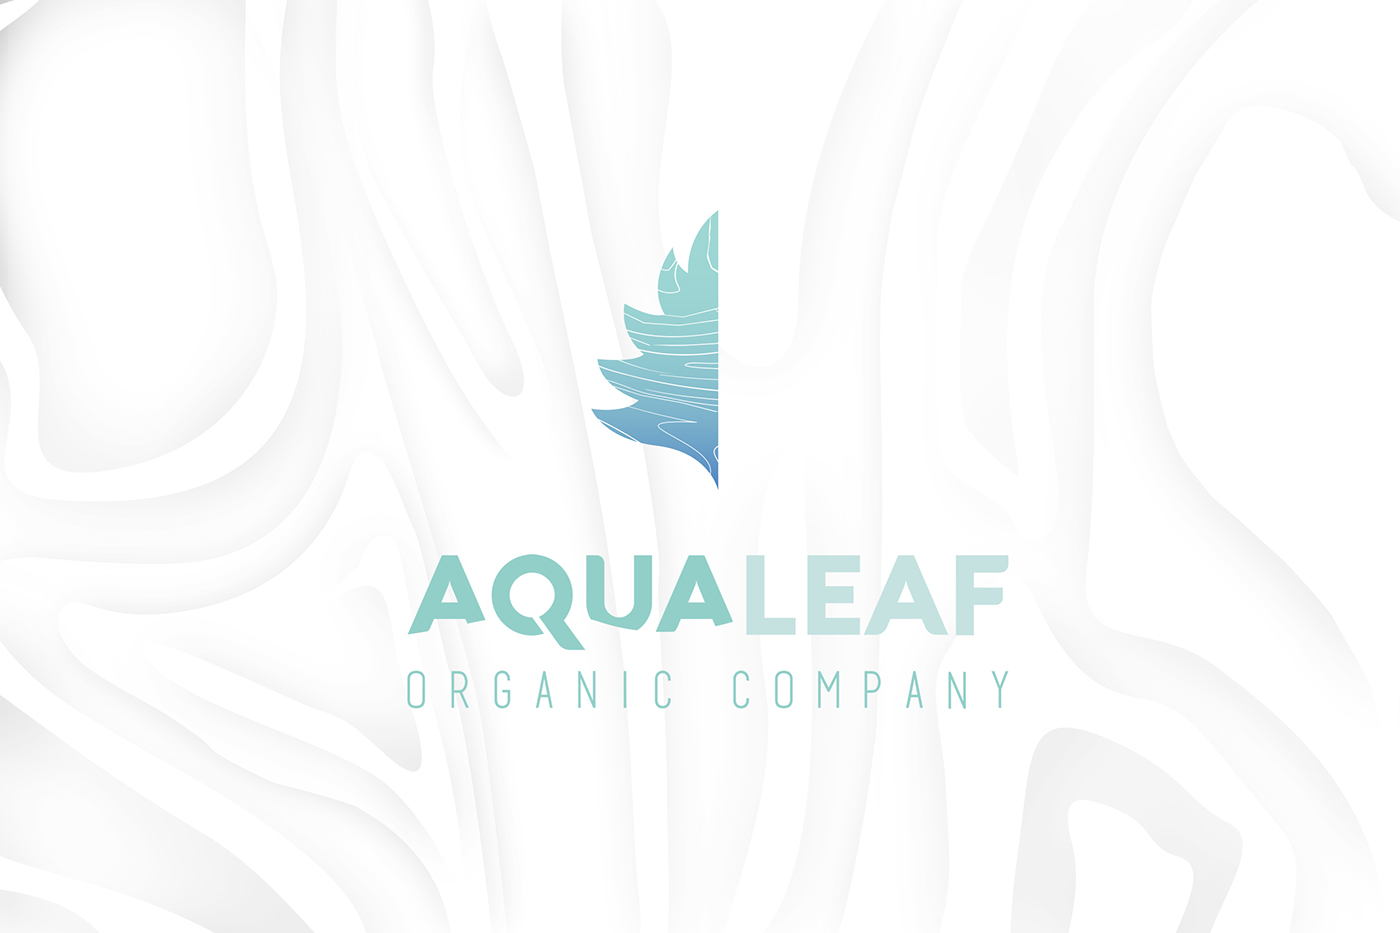 herbs vegetables organic salad labels lettuce microgreens hydroponic branding  restaurant